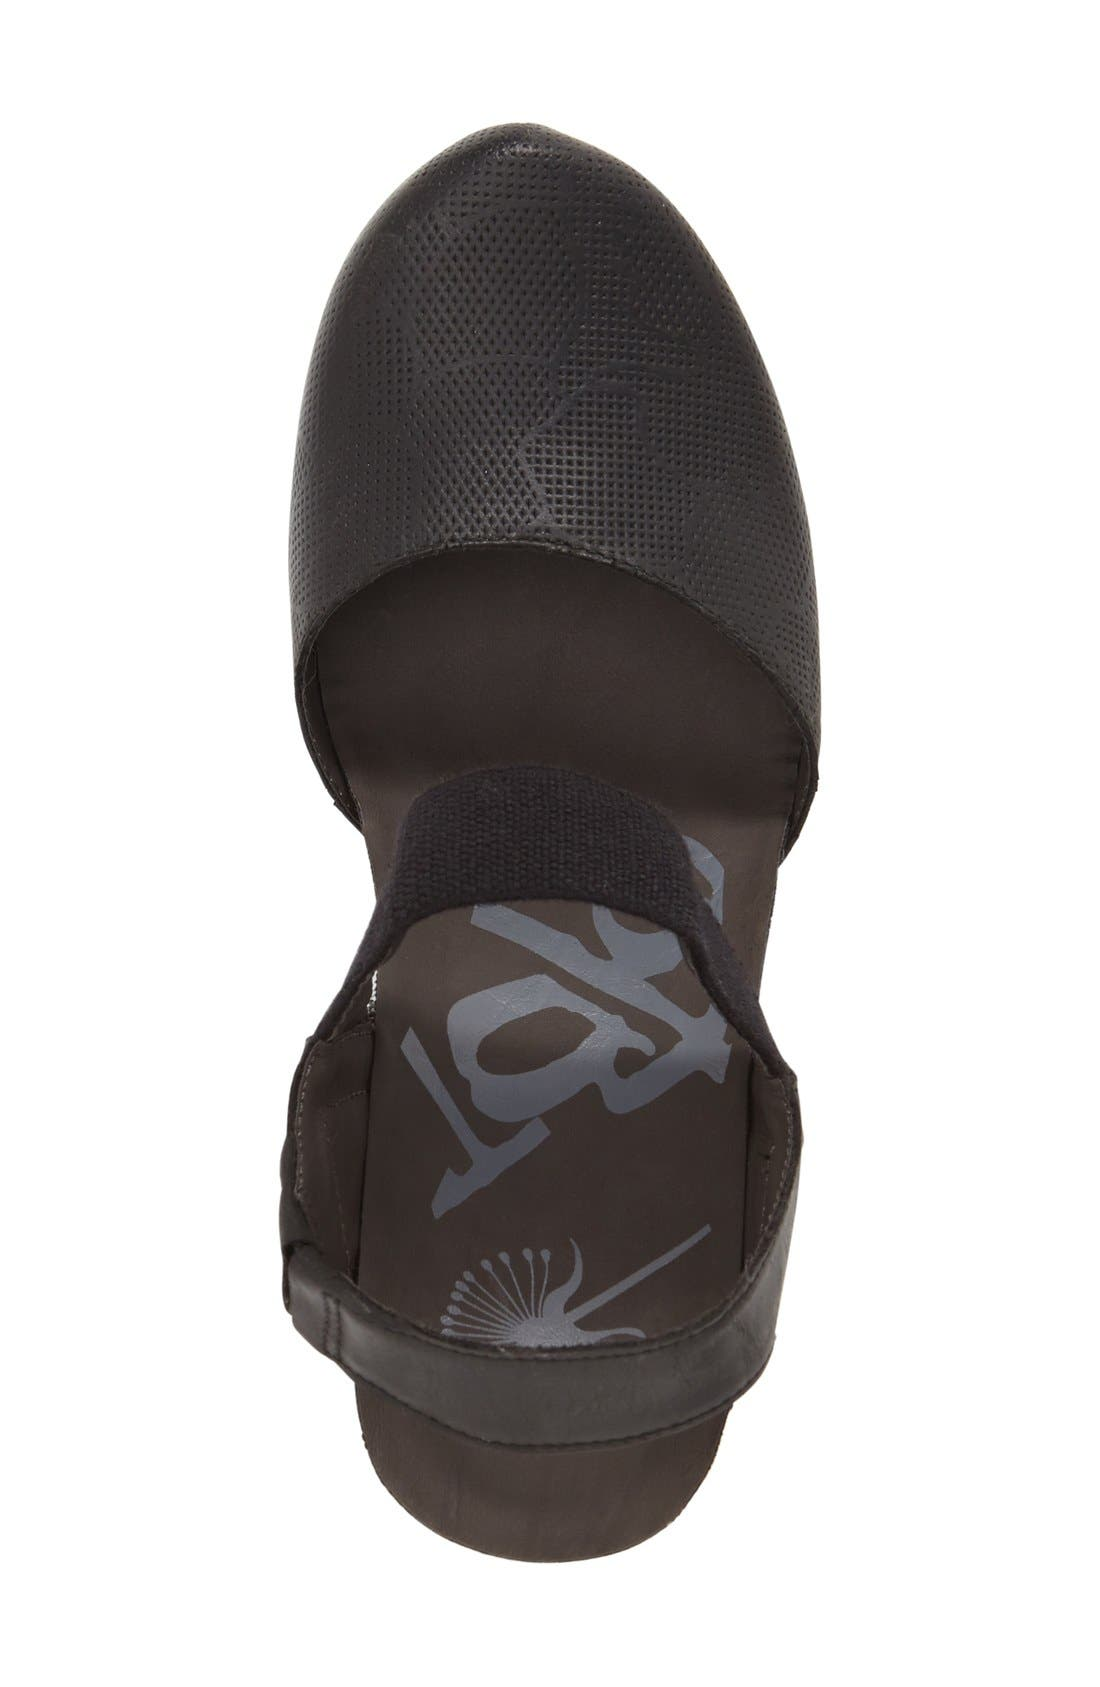 OTBT,                             'Rexburg' Wedge Sandal,                             Alternate thumbnail 3, color,                             019